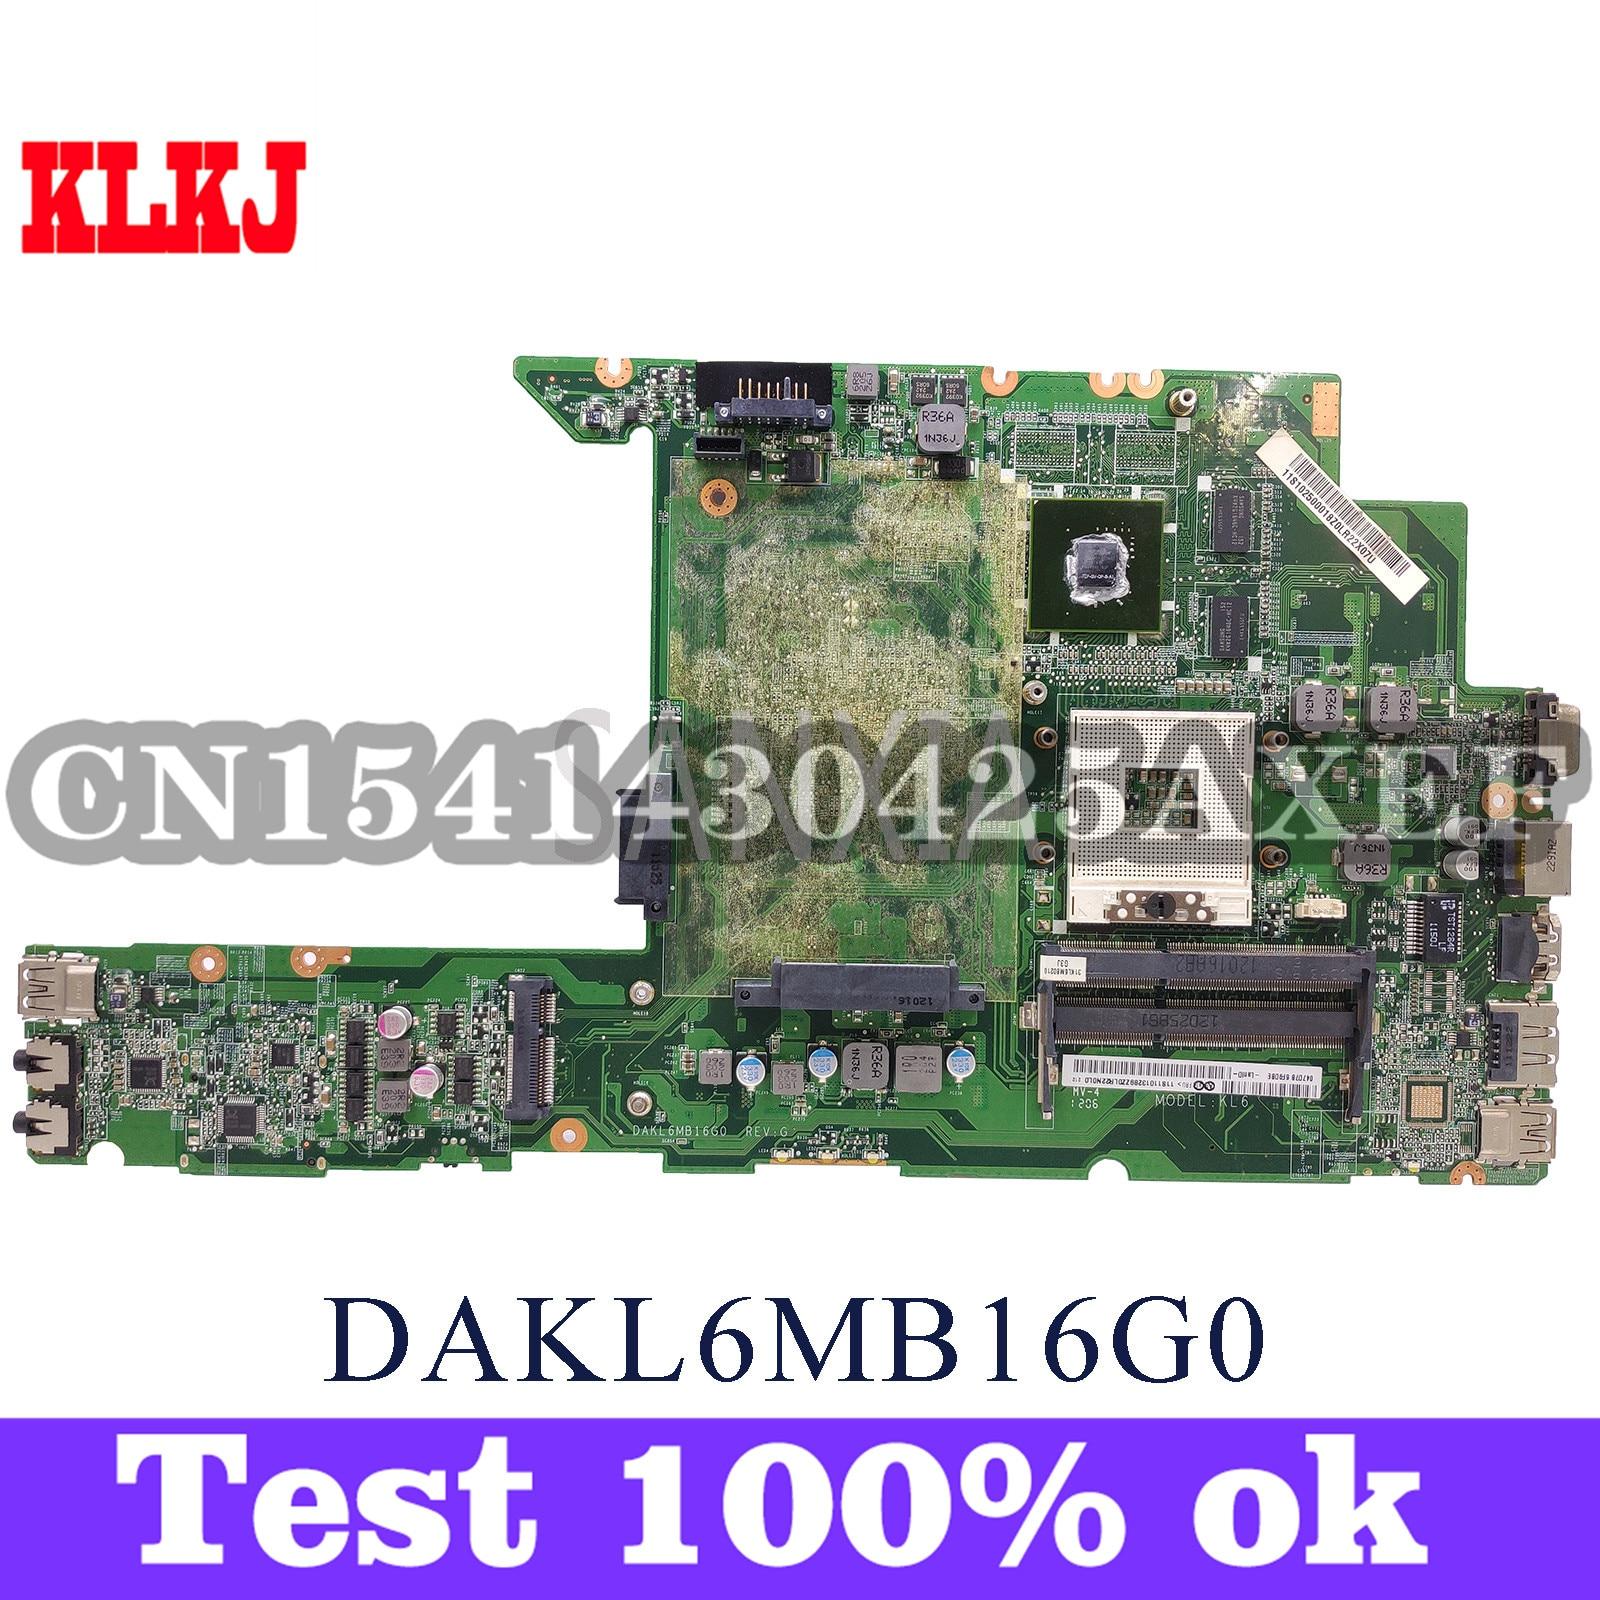 KLKJ DAKL6MB16G0 اللوحة الأم للكمبيوتر المحمول لينوفو Z470 اللوحة الرئيسية الأصلية